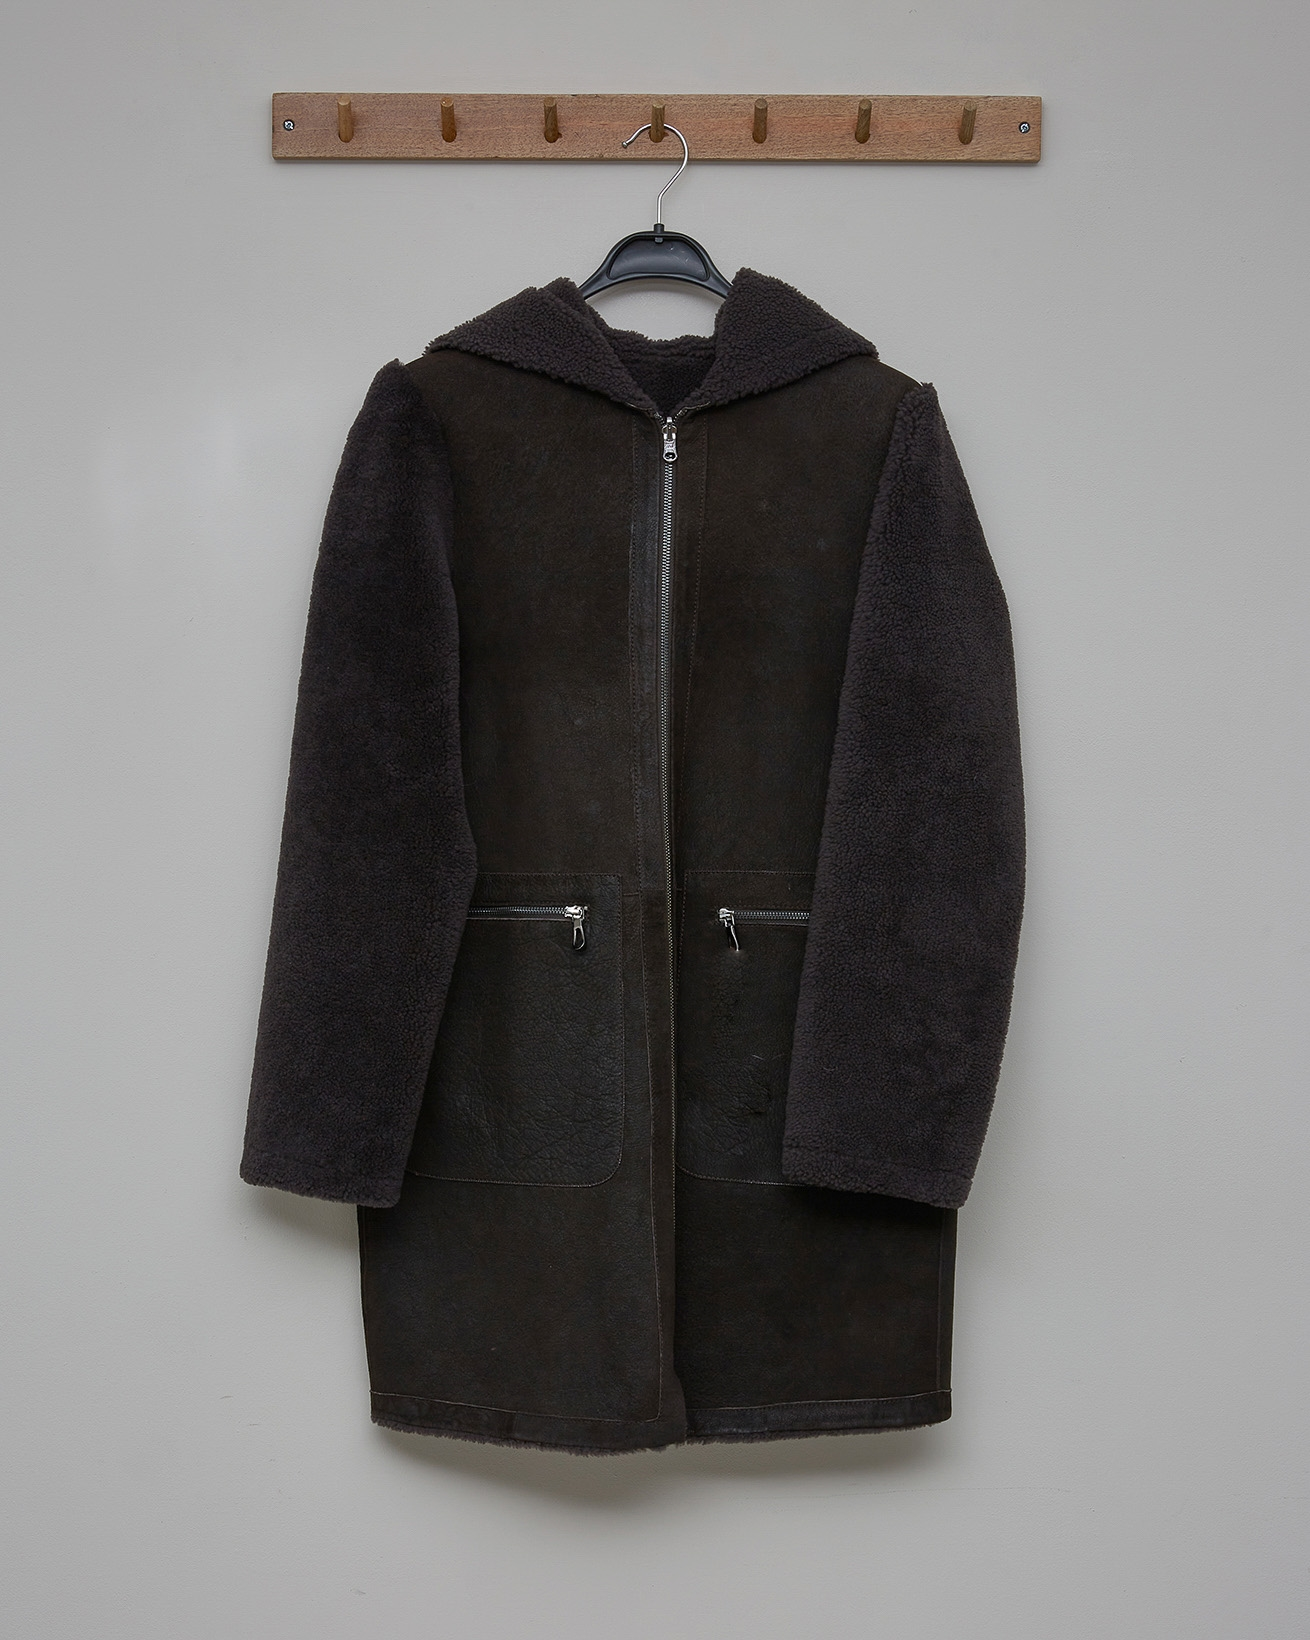 Reversible Hooded Zip Up Sheepskin Coat - Mocca - Size  12 - 2789